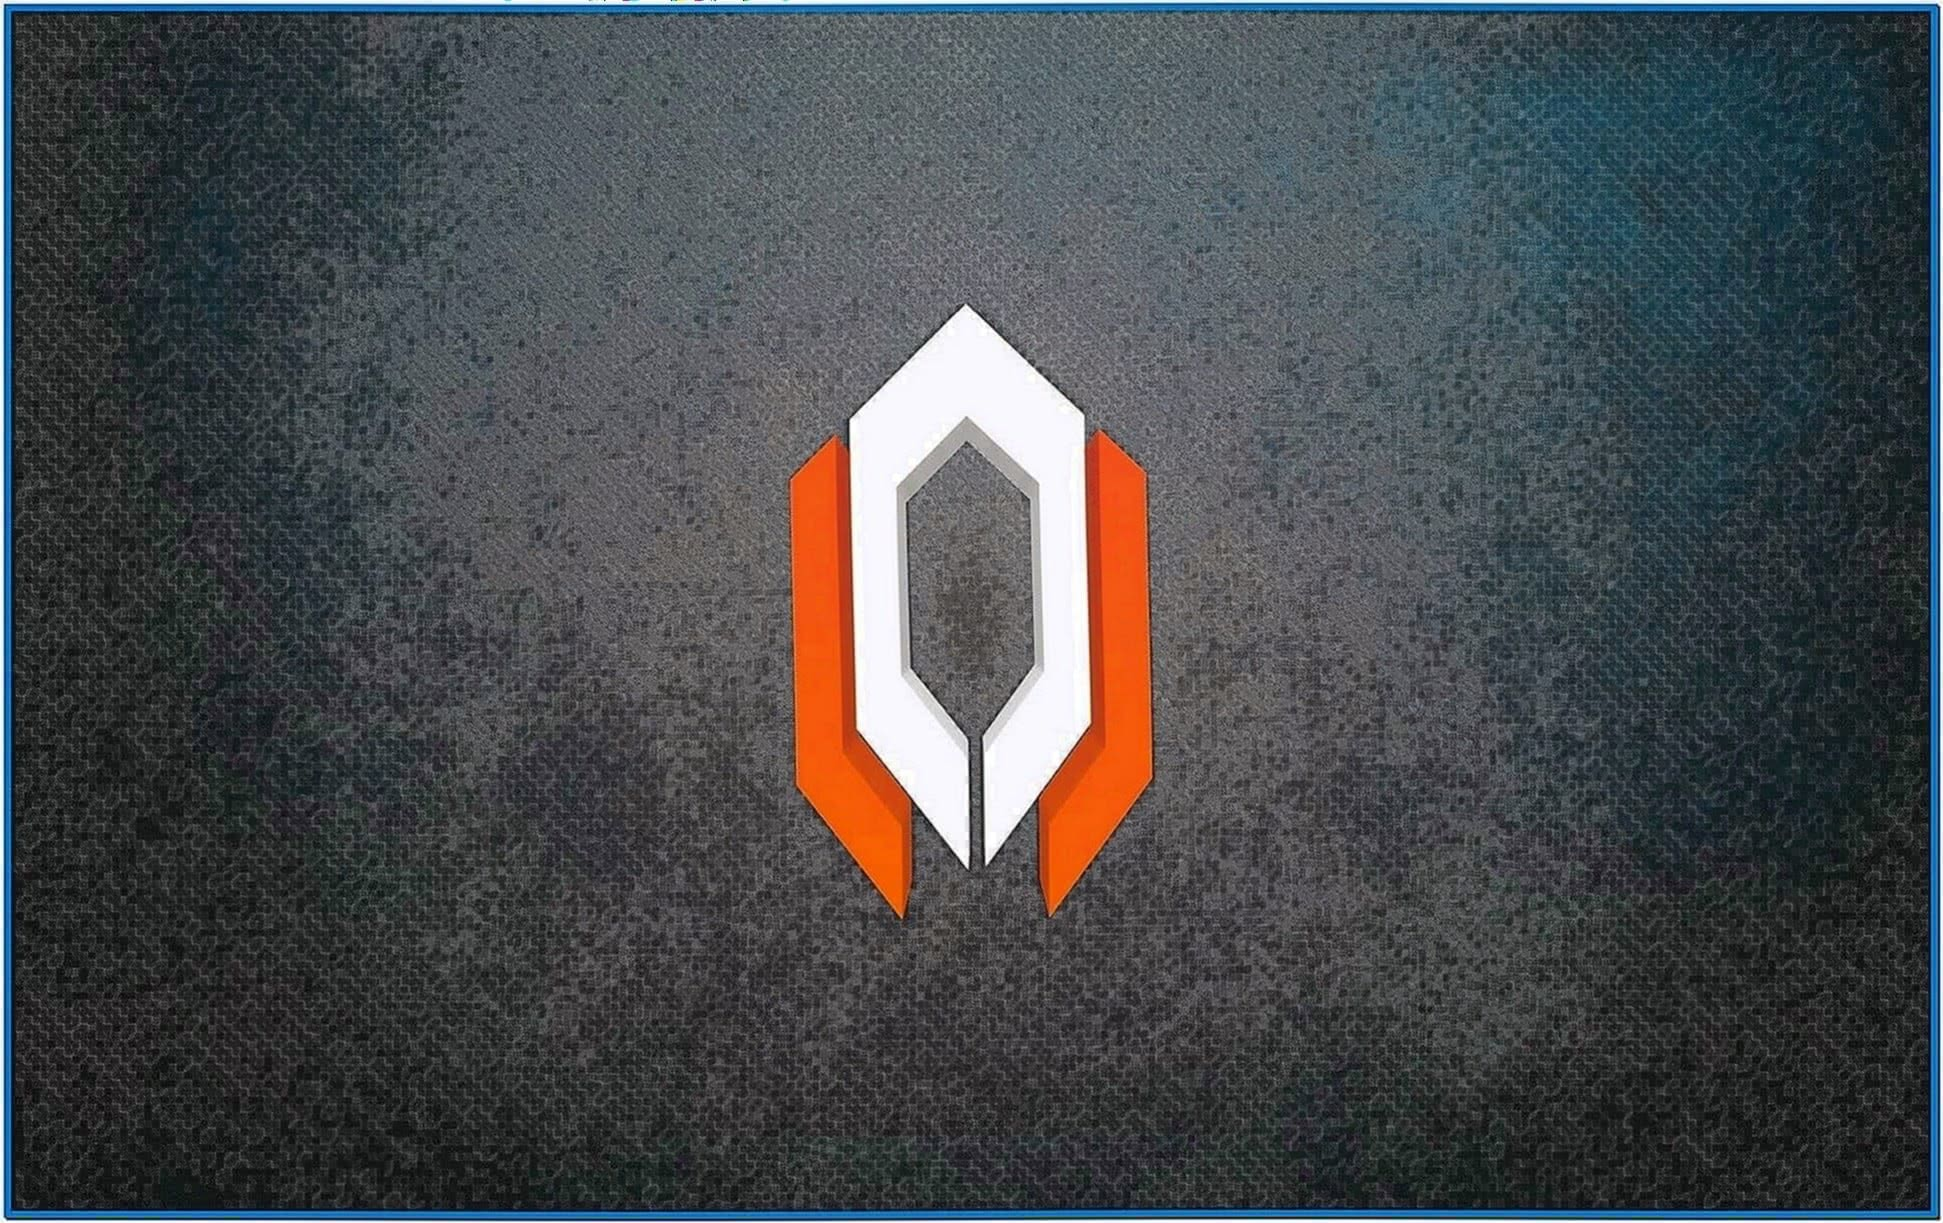 Mass Effect Cerberus Screensaver